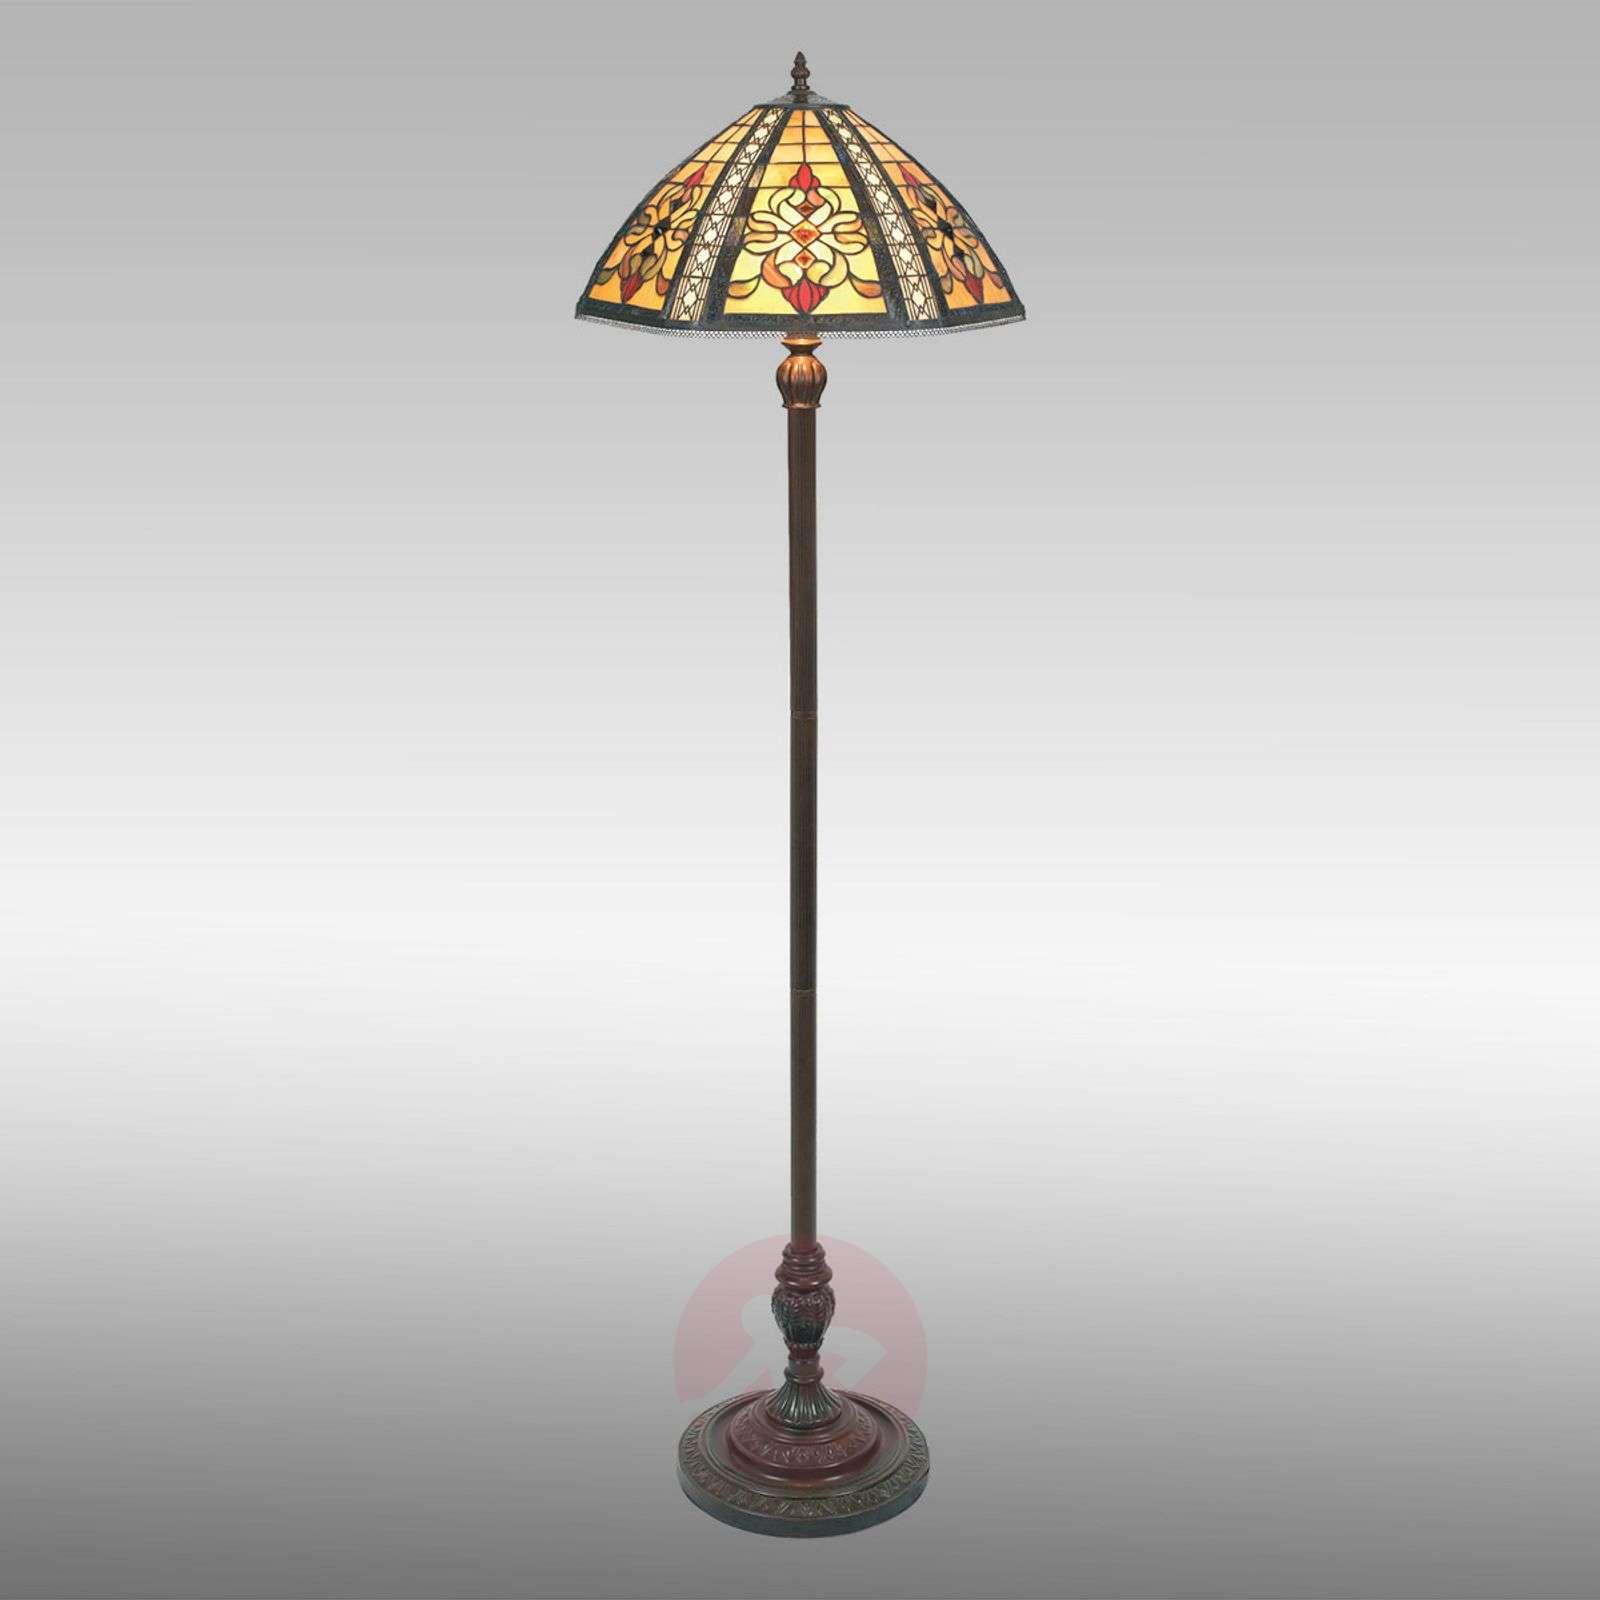 Floor lamp Despina, Tiffany style-1032146-02